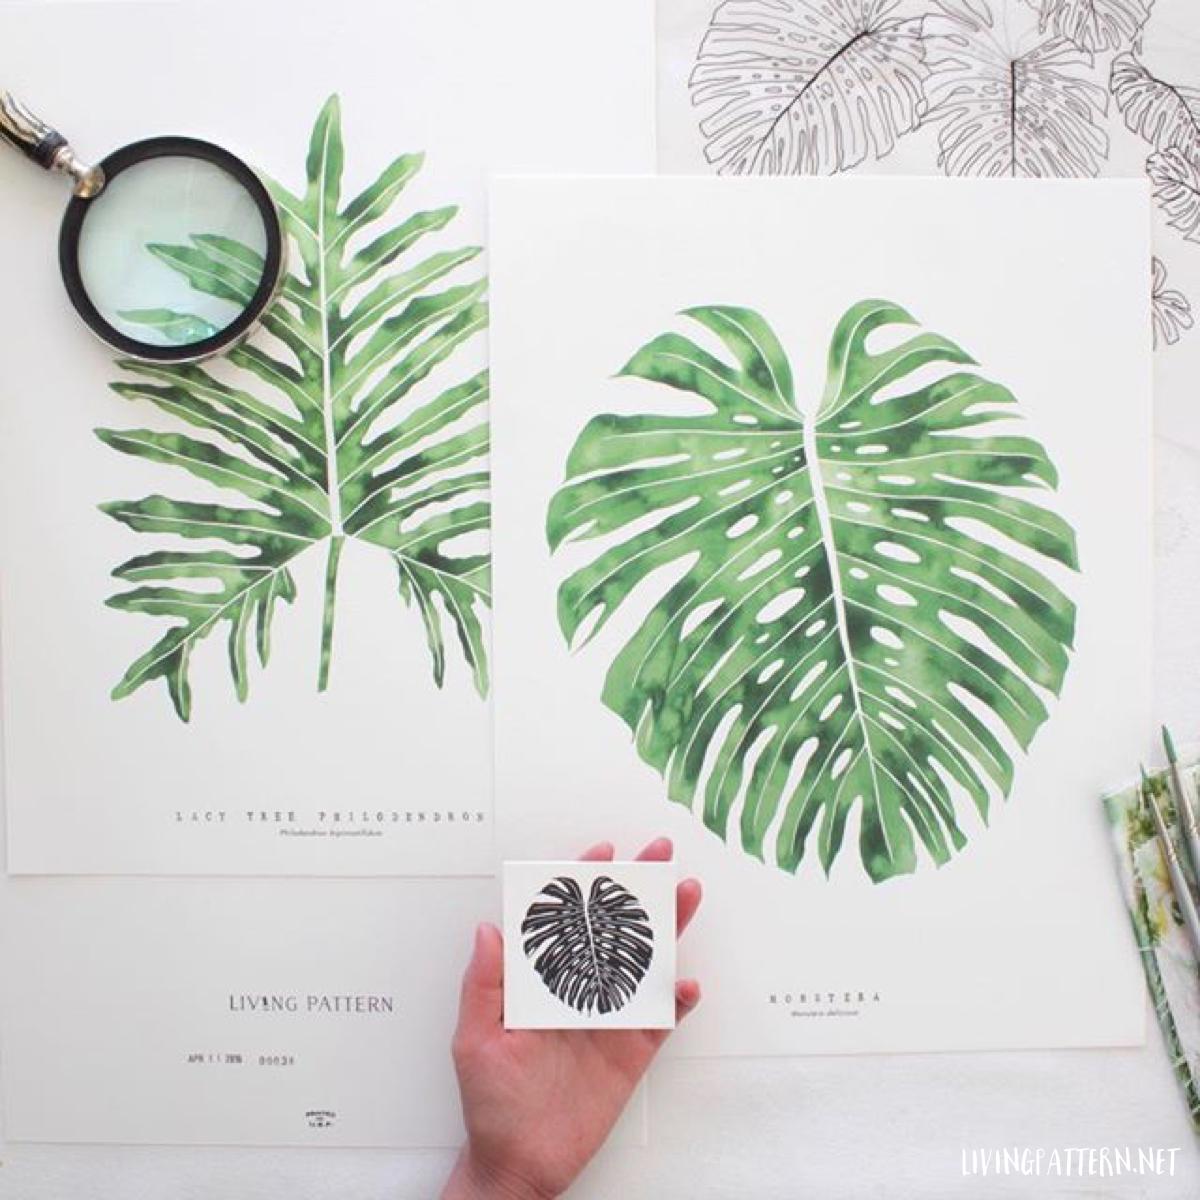 Jenny Kiker - Artist - Living Pattern - visual Saturdays - lovefromberlin.net